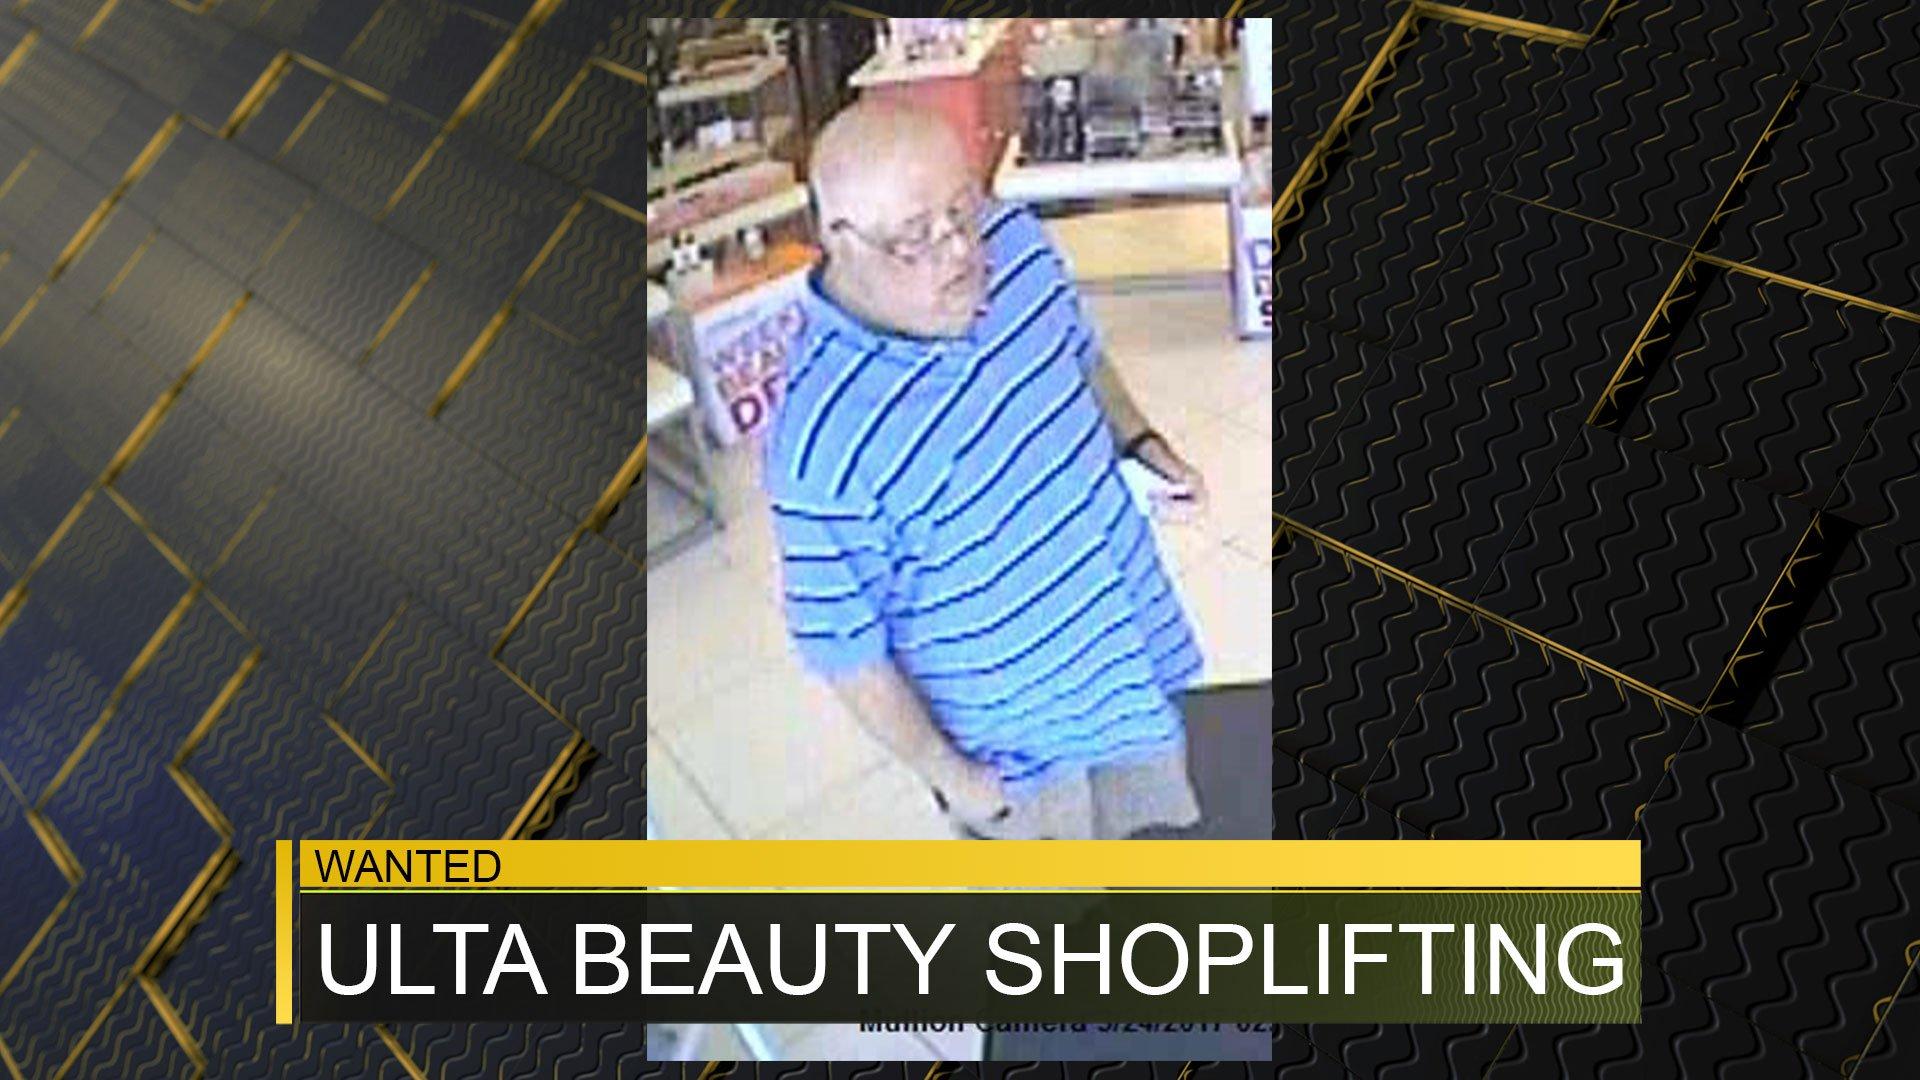 Ulta Beauty shoplifting subject 3/24/17 (source: Richmond County Sheriff's Office)